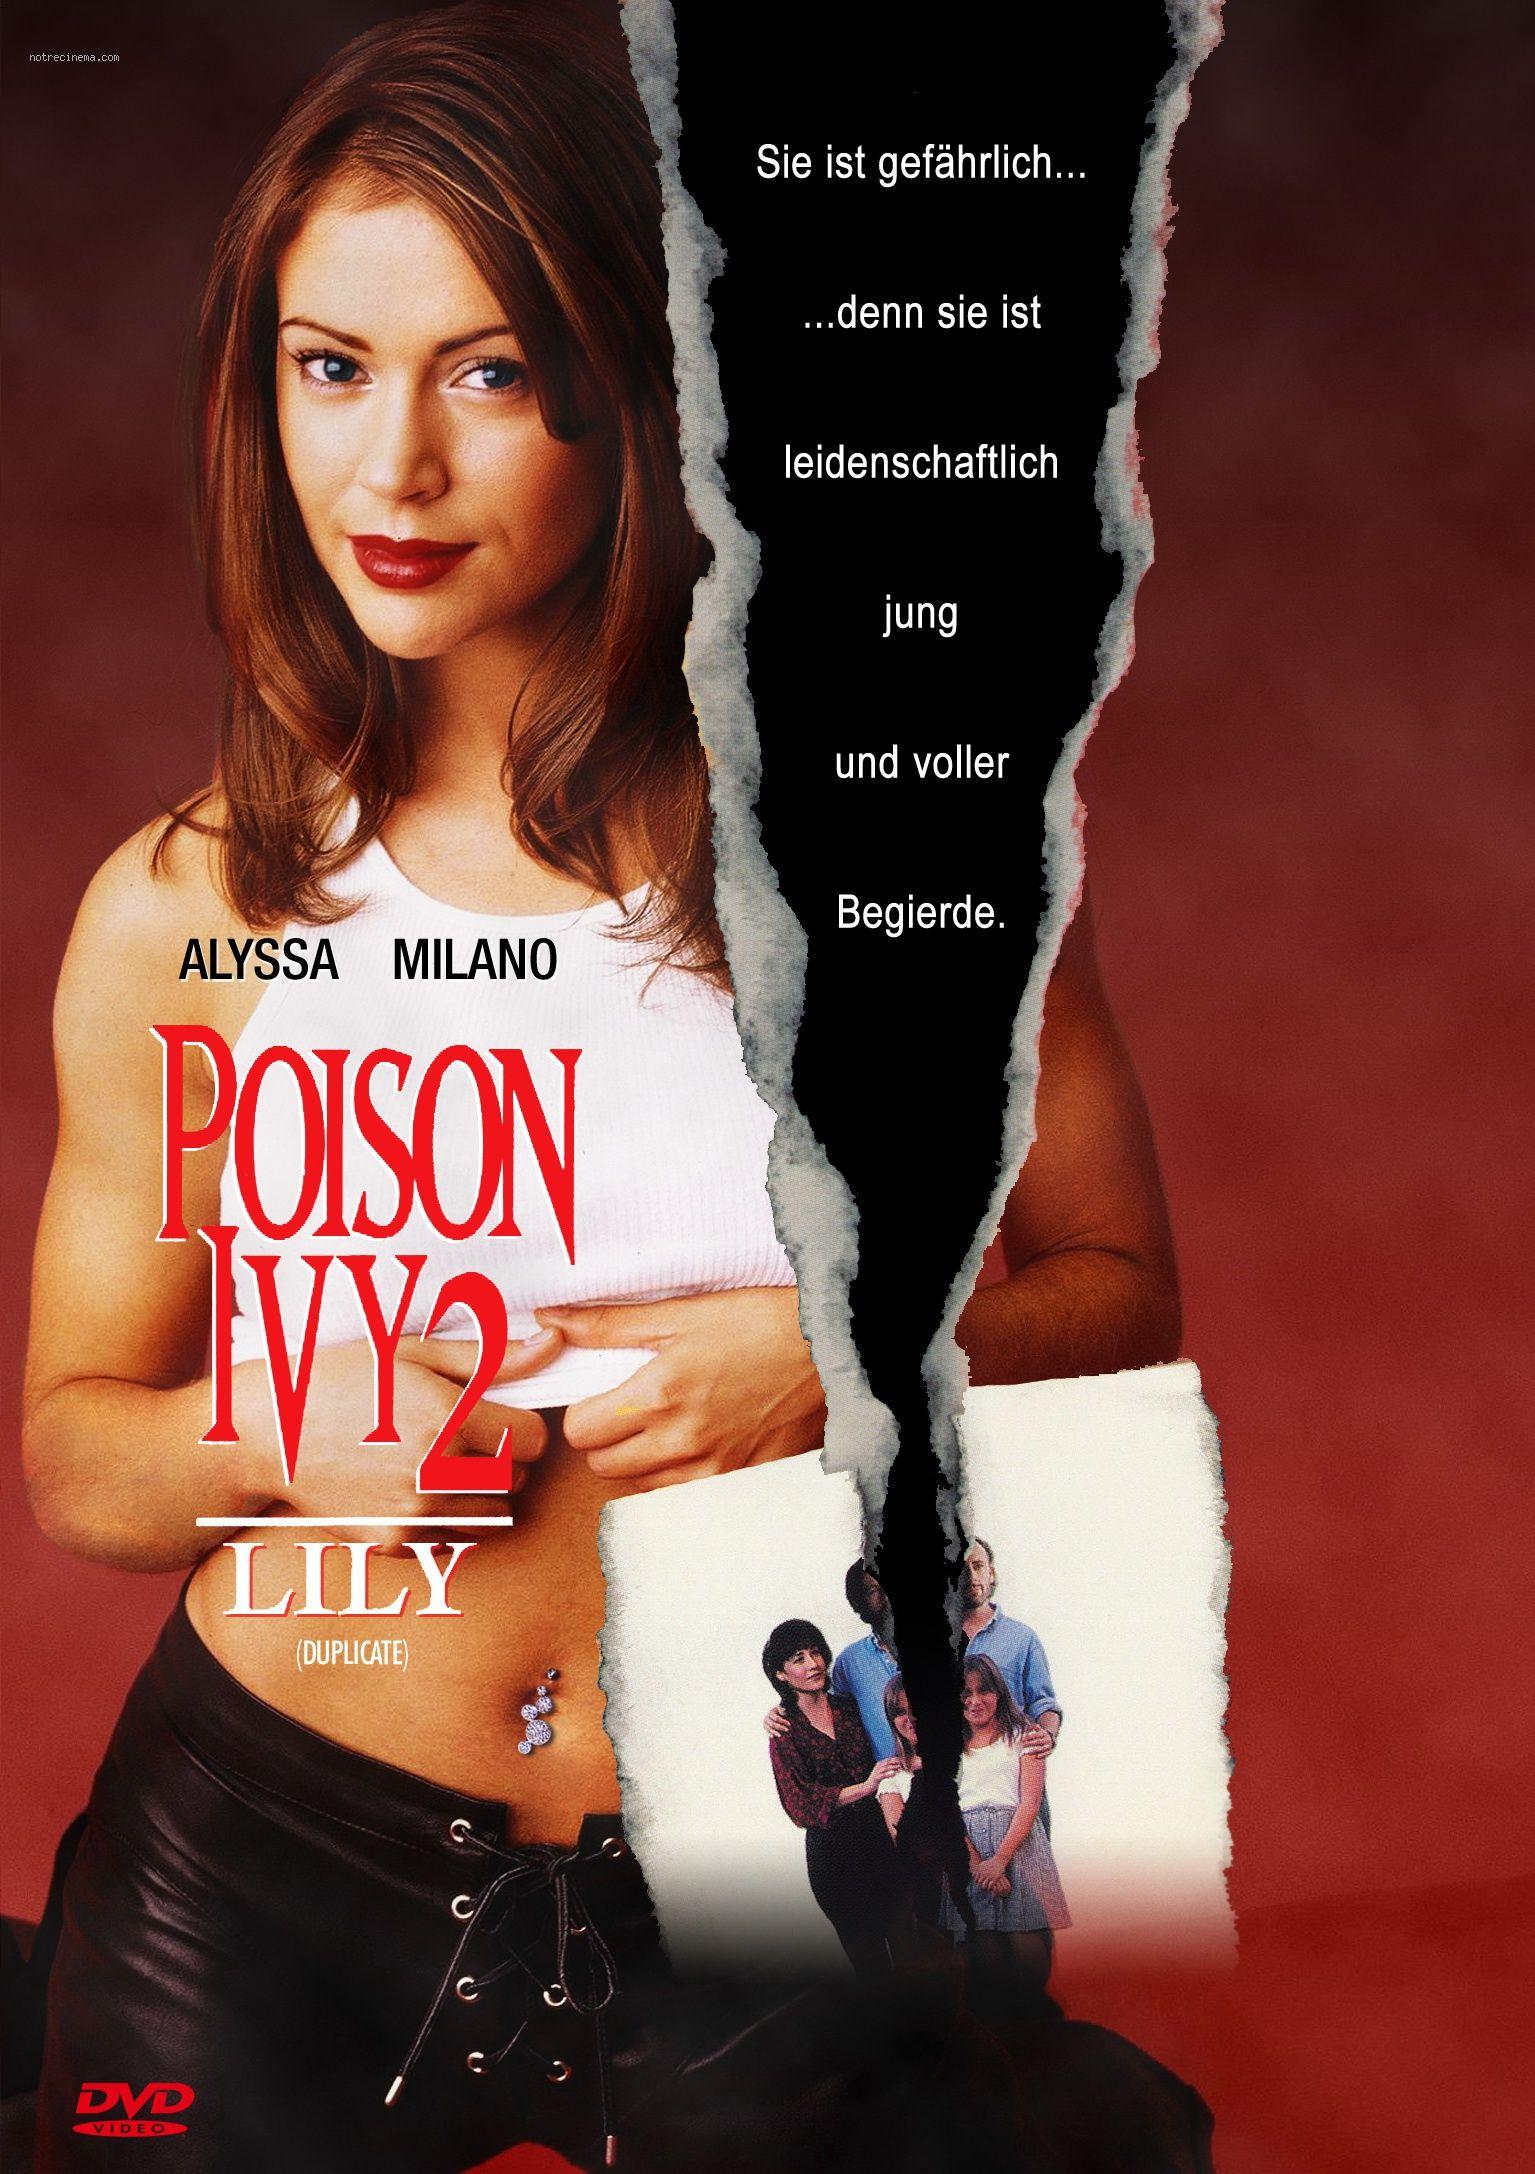 Alyssa Milano Poison Ivy 2 poison ivy 2, lily | poison ivy, poison ivy 2, ivy